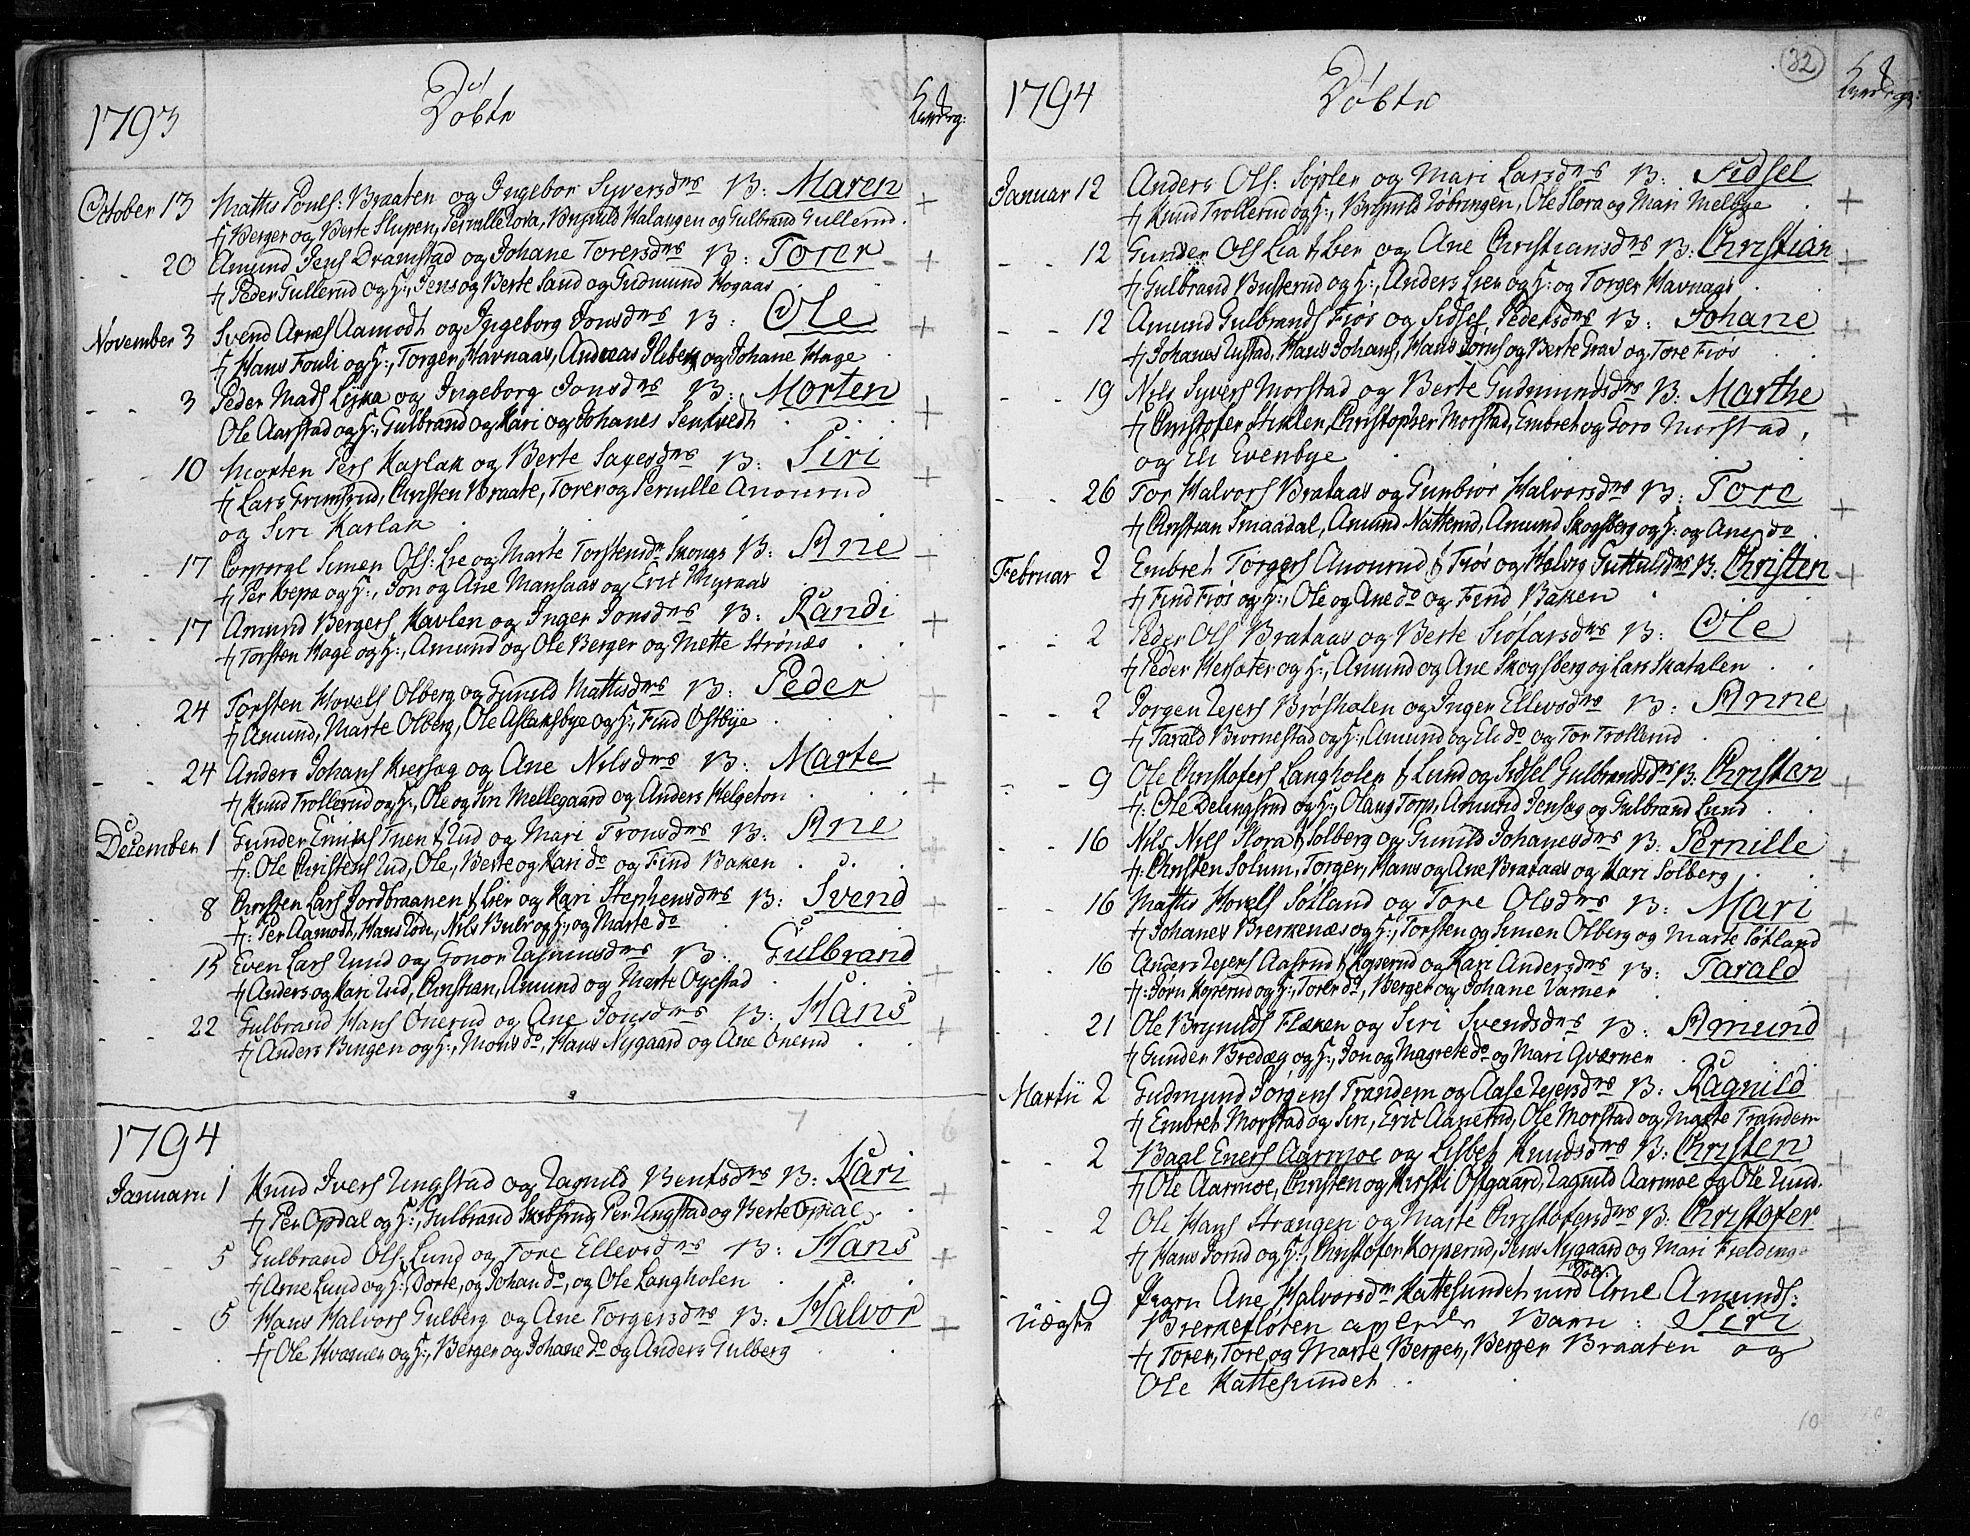 SAO, Trøgstad prestekontor Kirkebøker, F/Fa/L0005: Ministerialbok nr. I 5, 1784-1814, s. 32